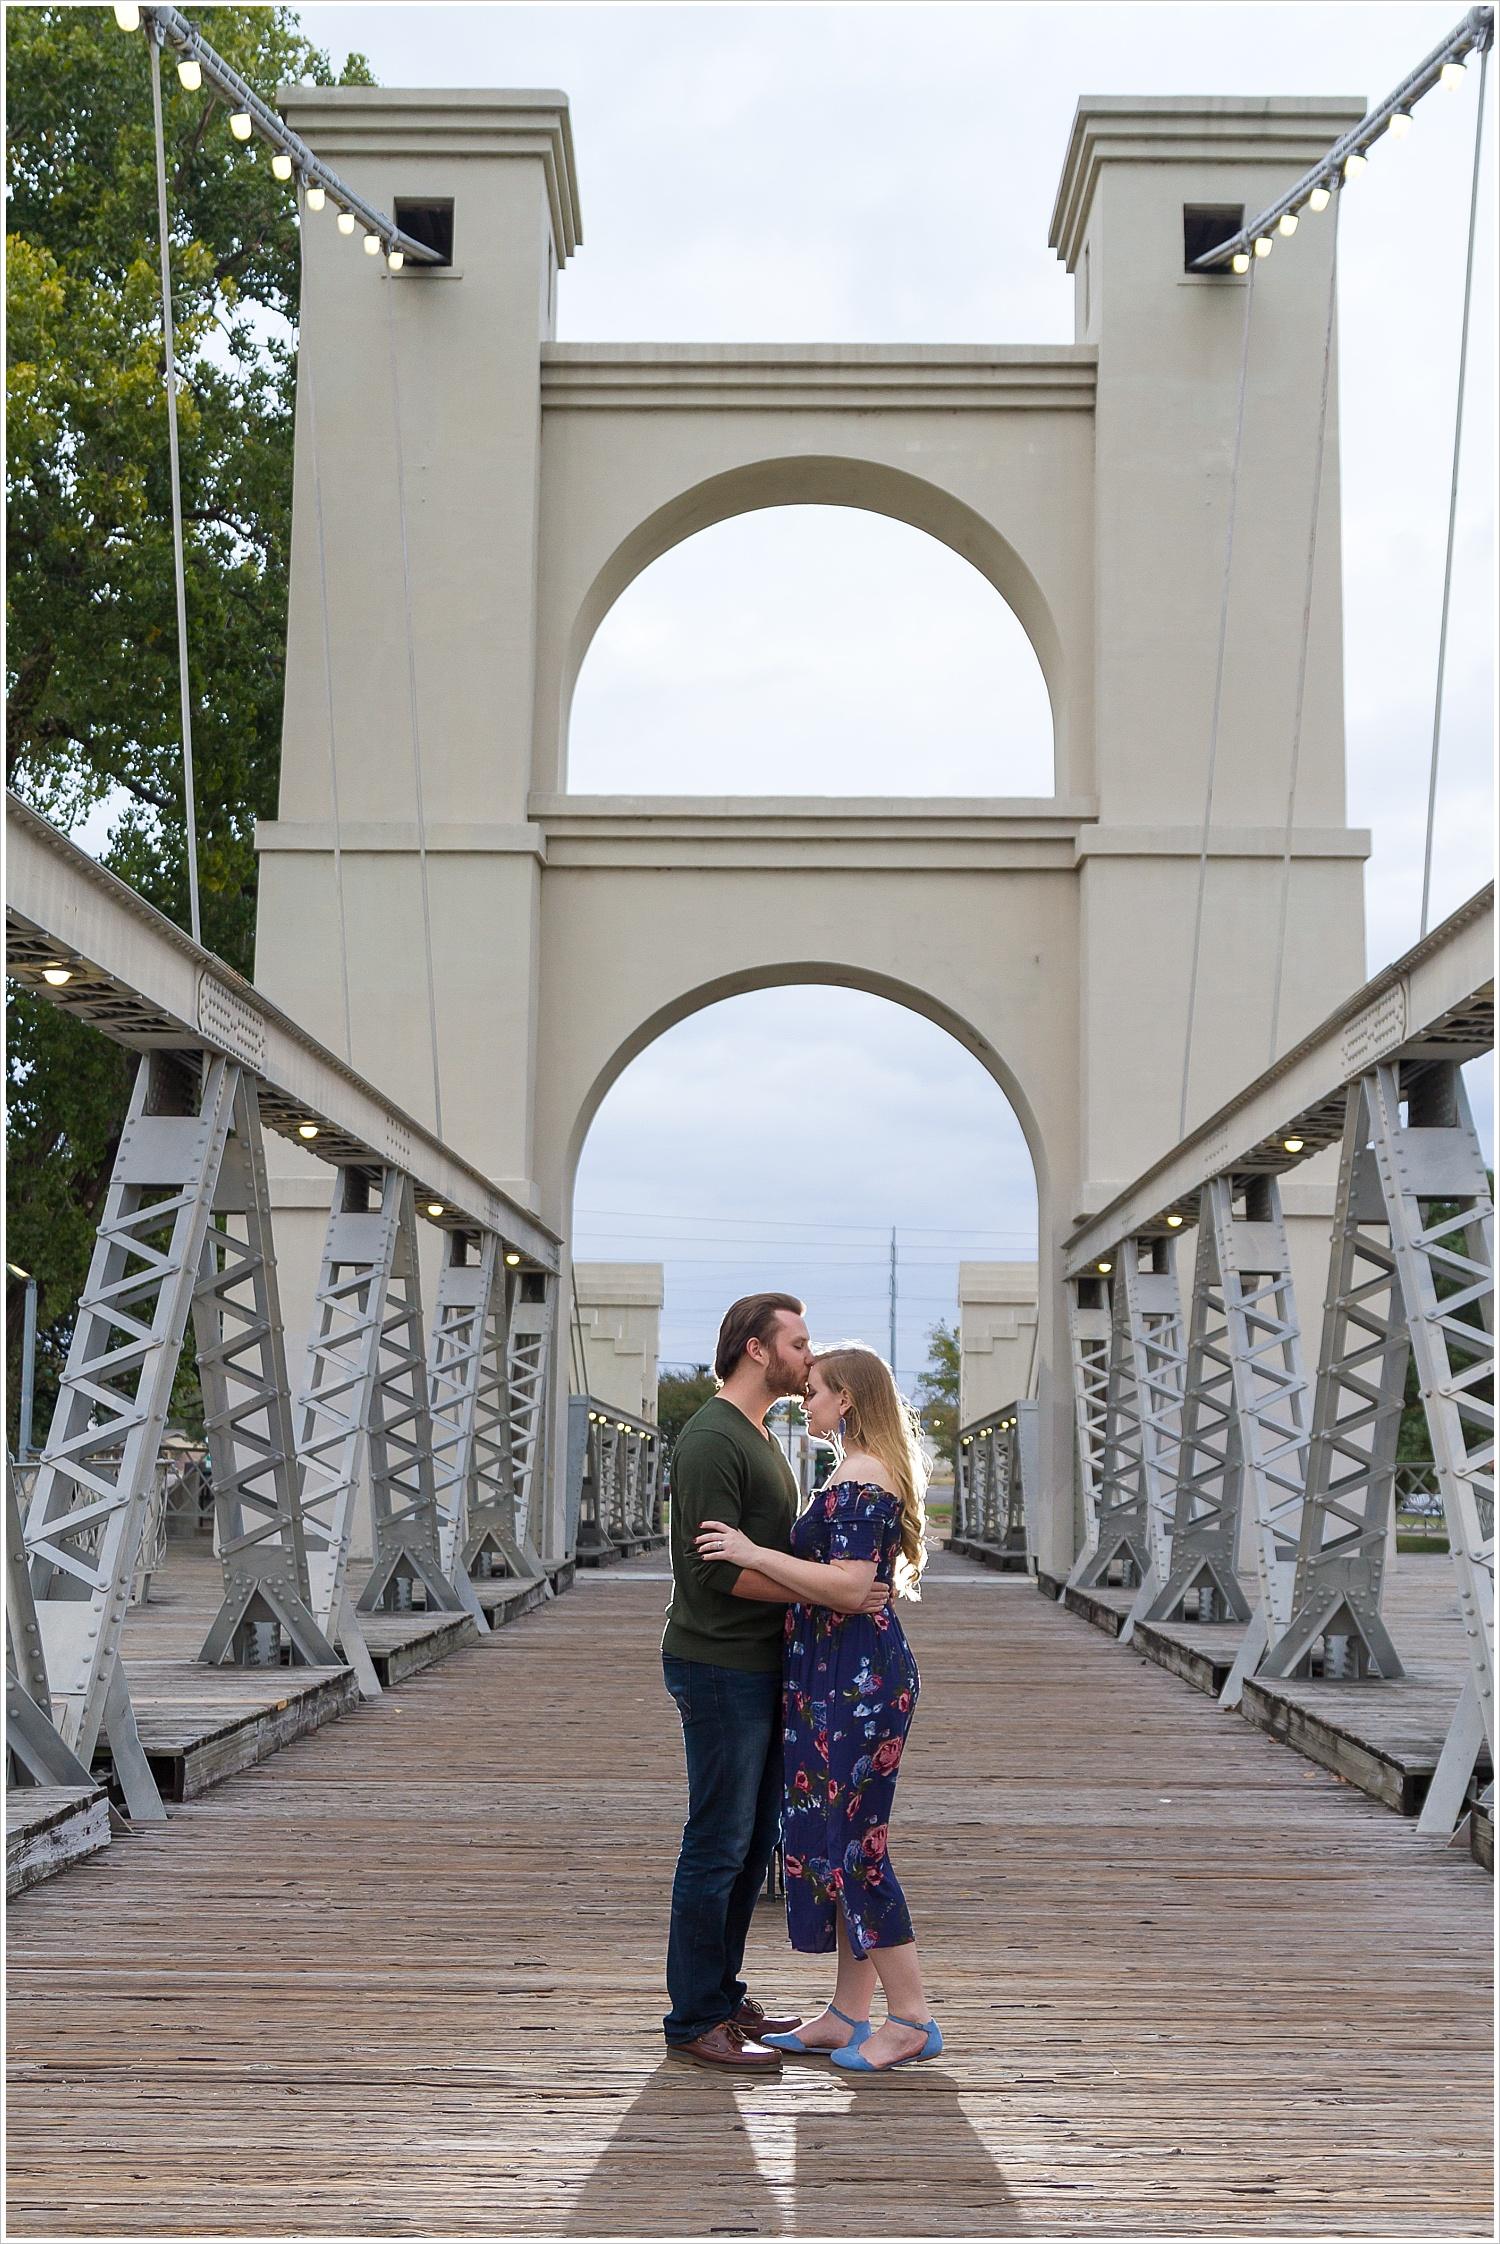 A man kisses his fiance's forehead as they embrace during their engagement photos on the Waco Suspension Bridge - Jason & Melaina Photography - www.jasonandmelaina.com